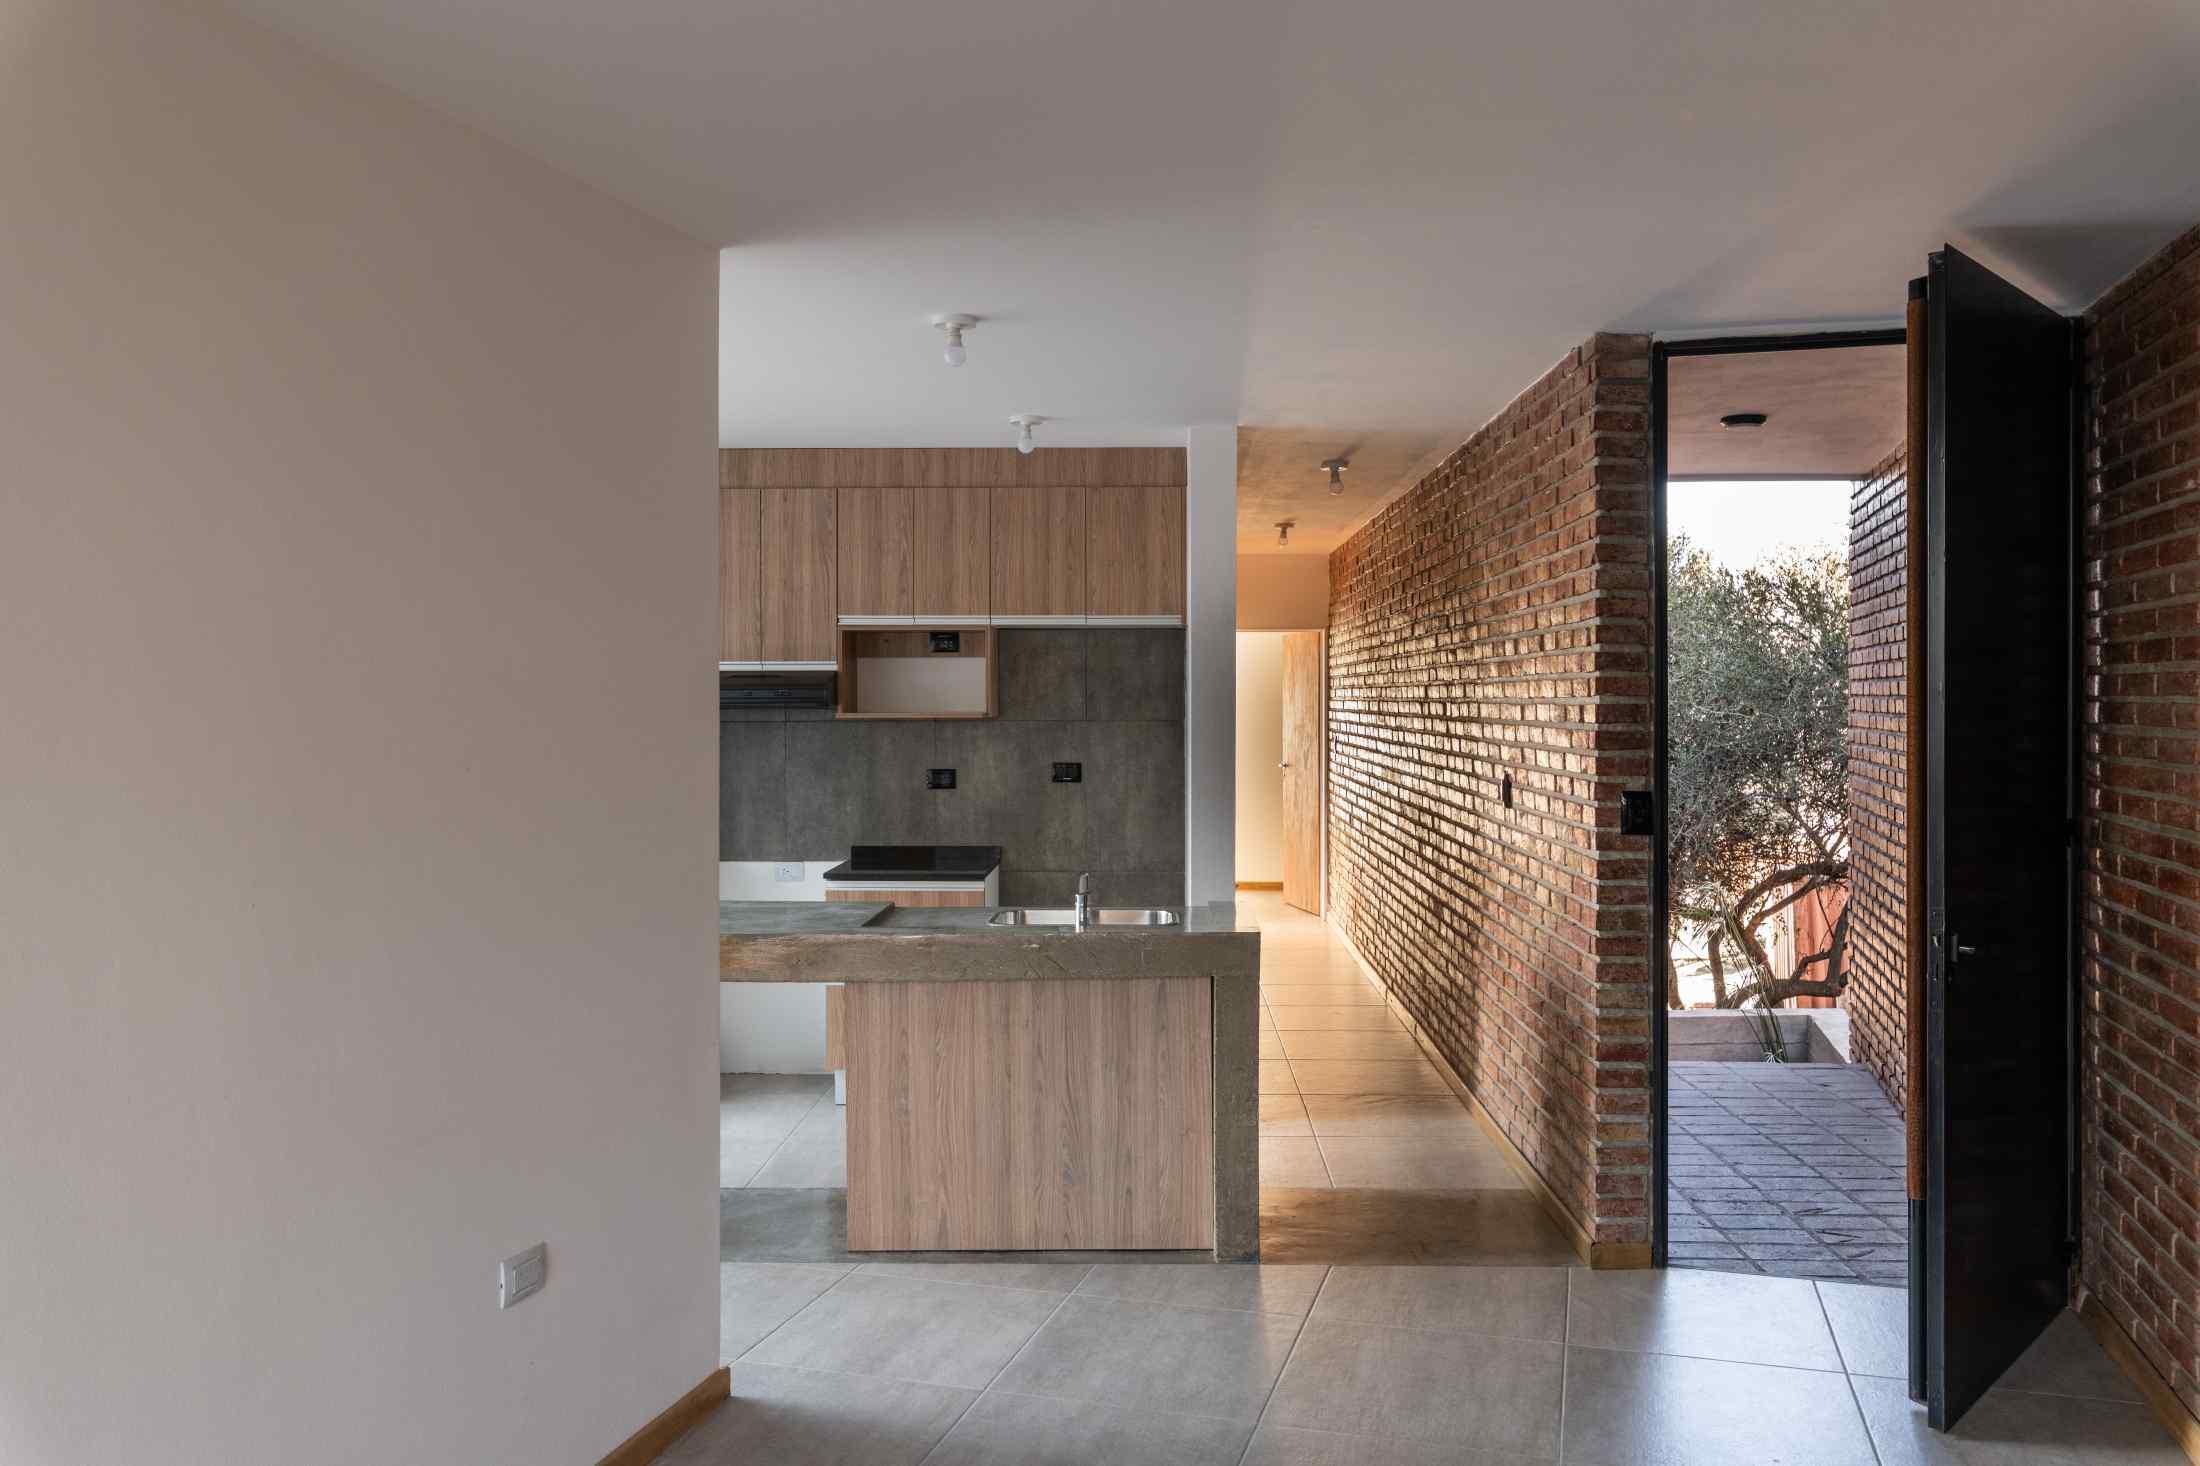 Vchod do kuchyne s tehlovou stenou